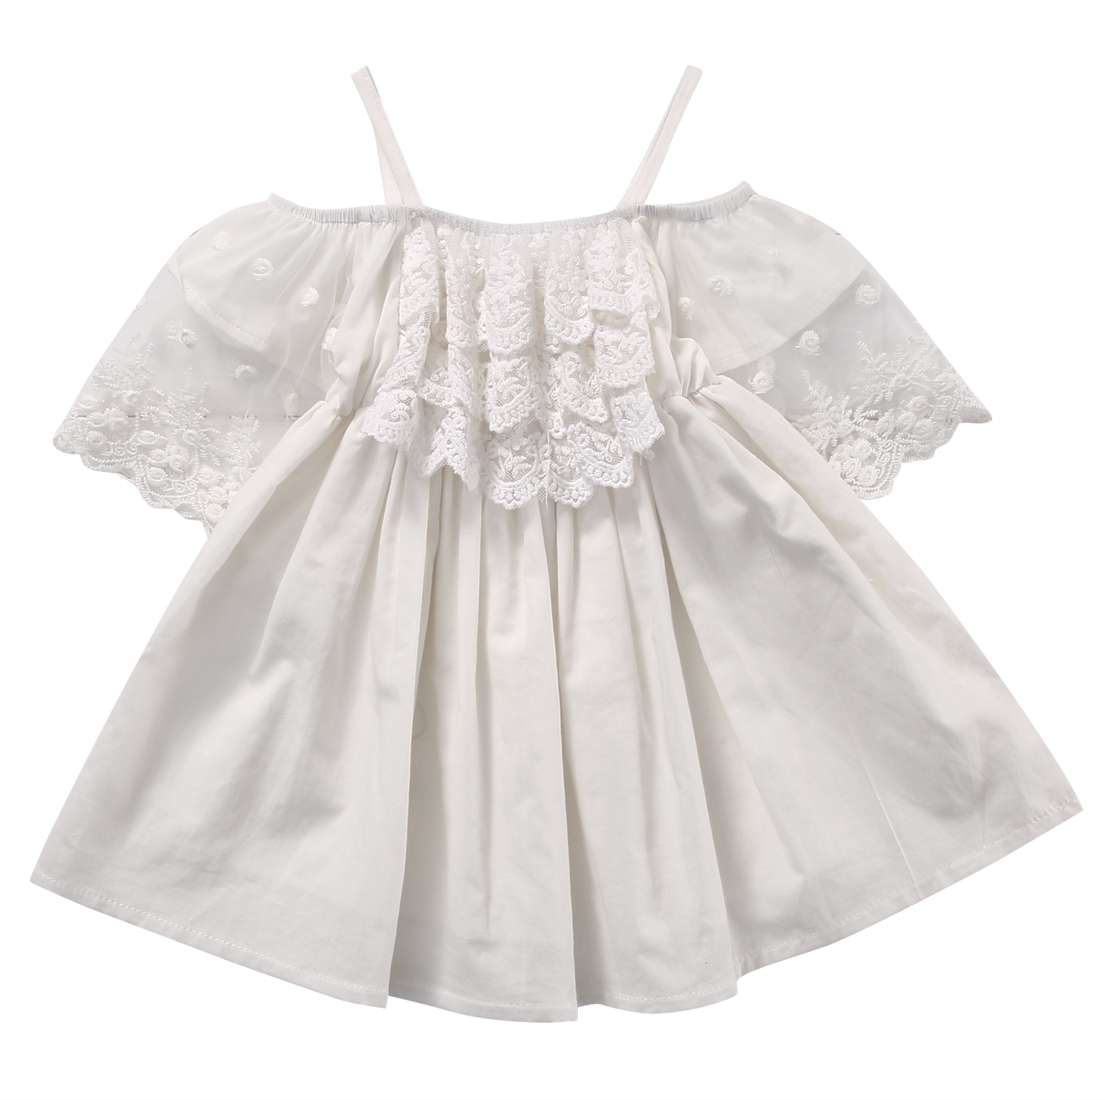 Toddler Summer Fashion Princess Girl TuTu Dress Off Shoulder Wedding Party Dress